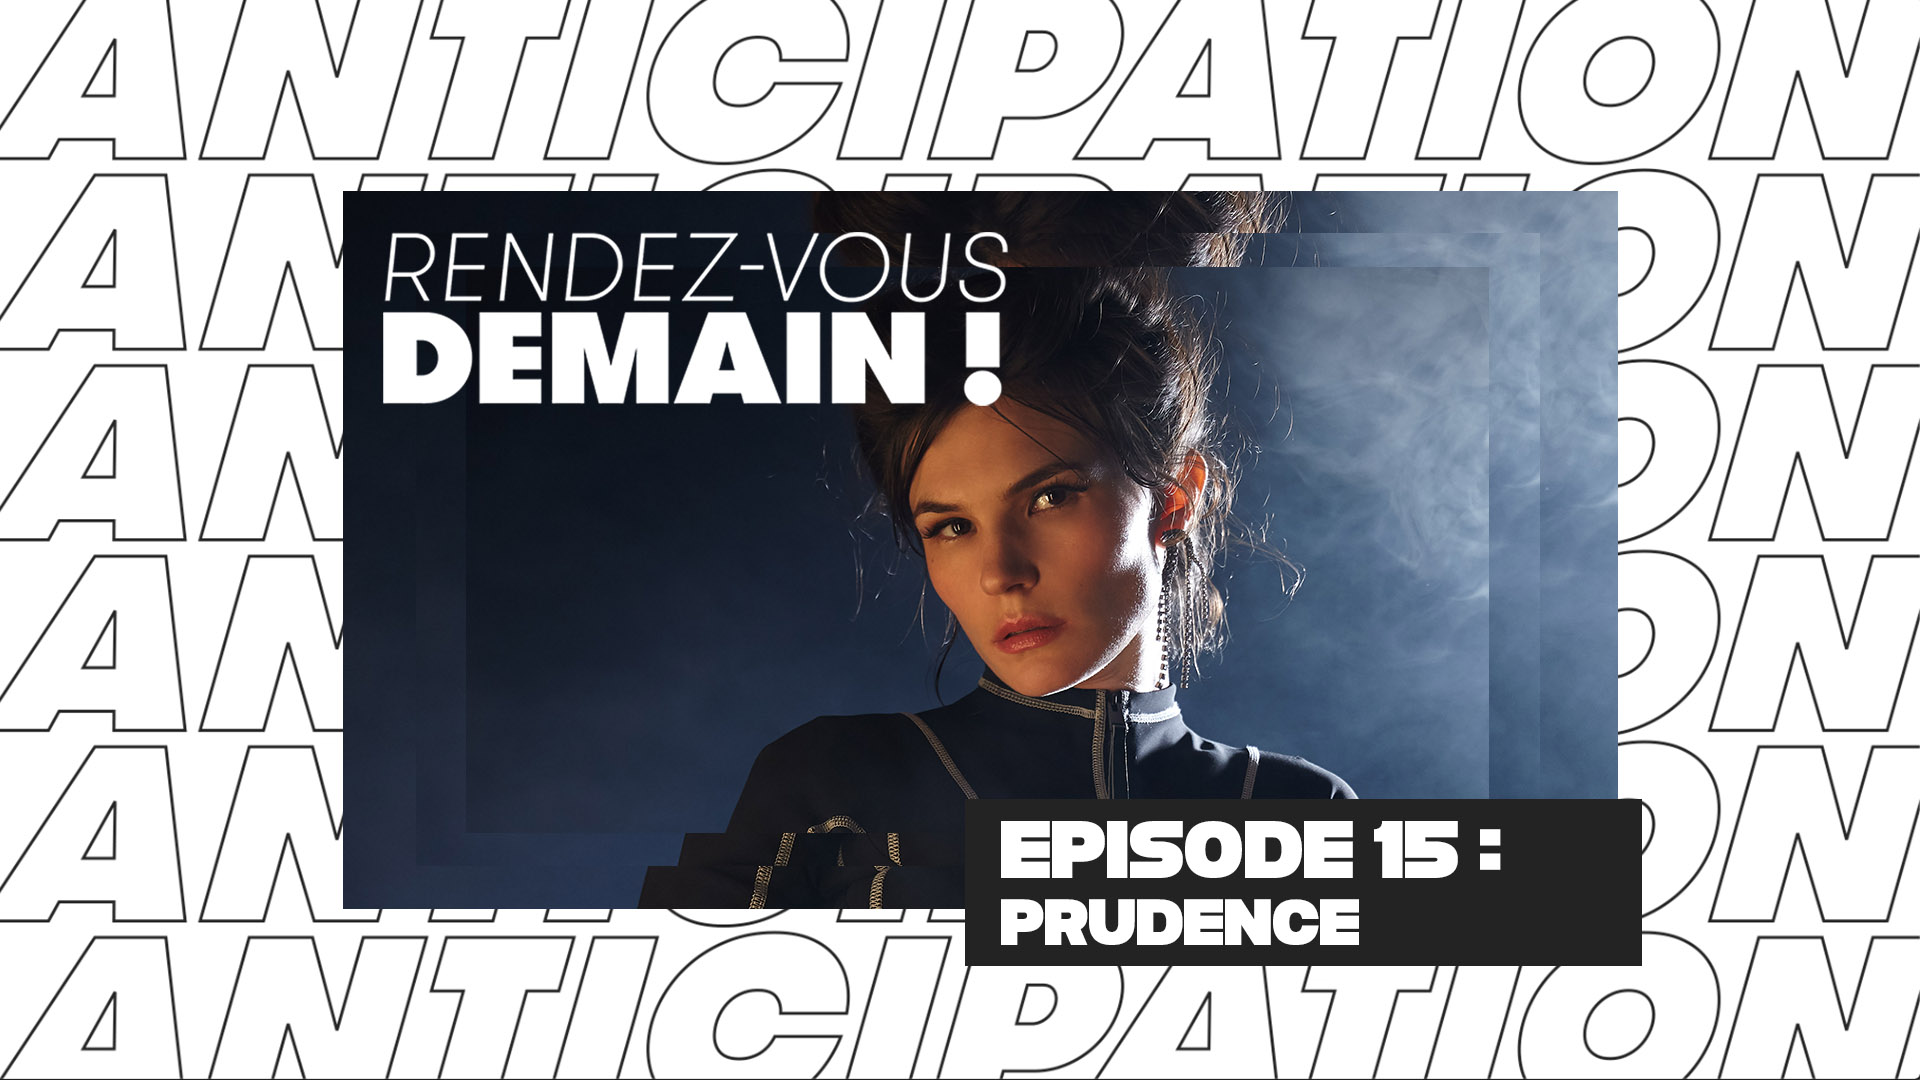 RENDEZ-VOUS DEMAIN ! - PRUDENCE